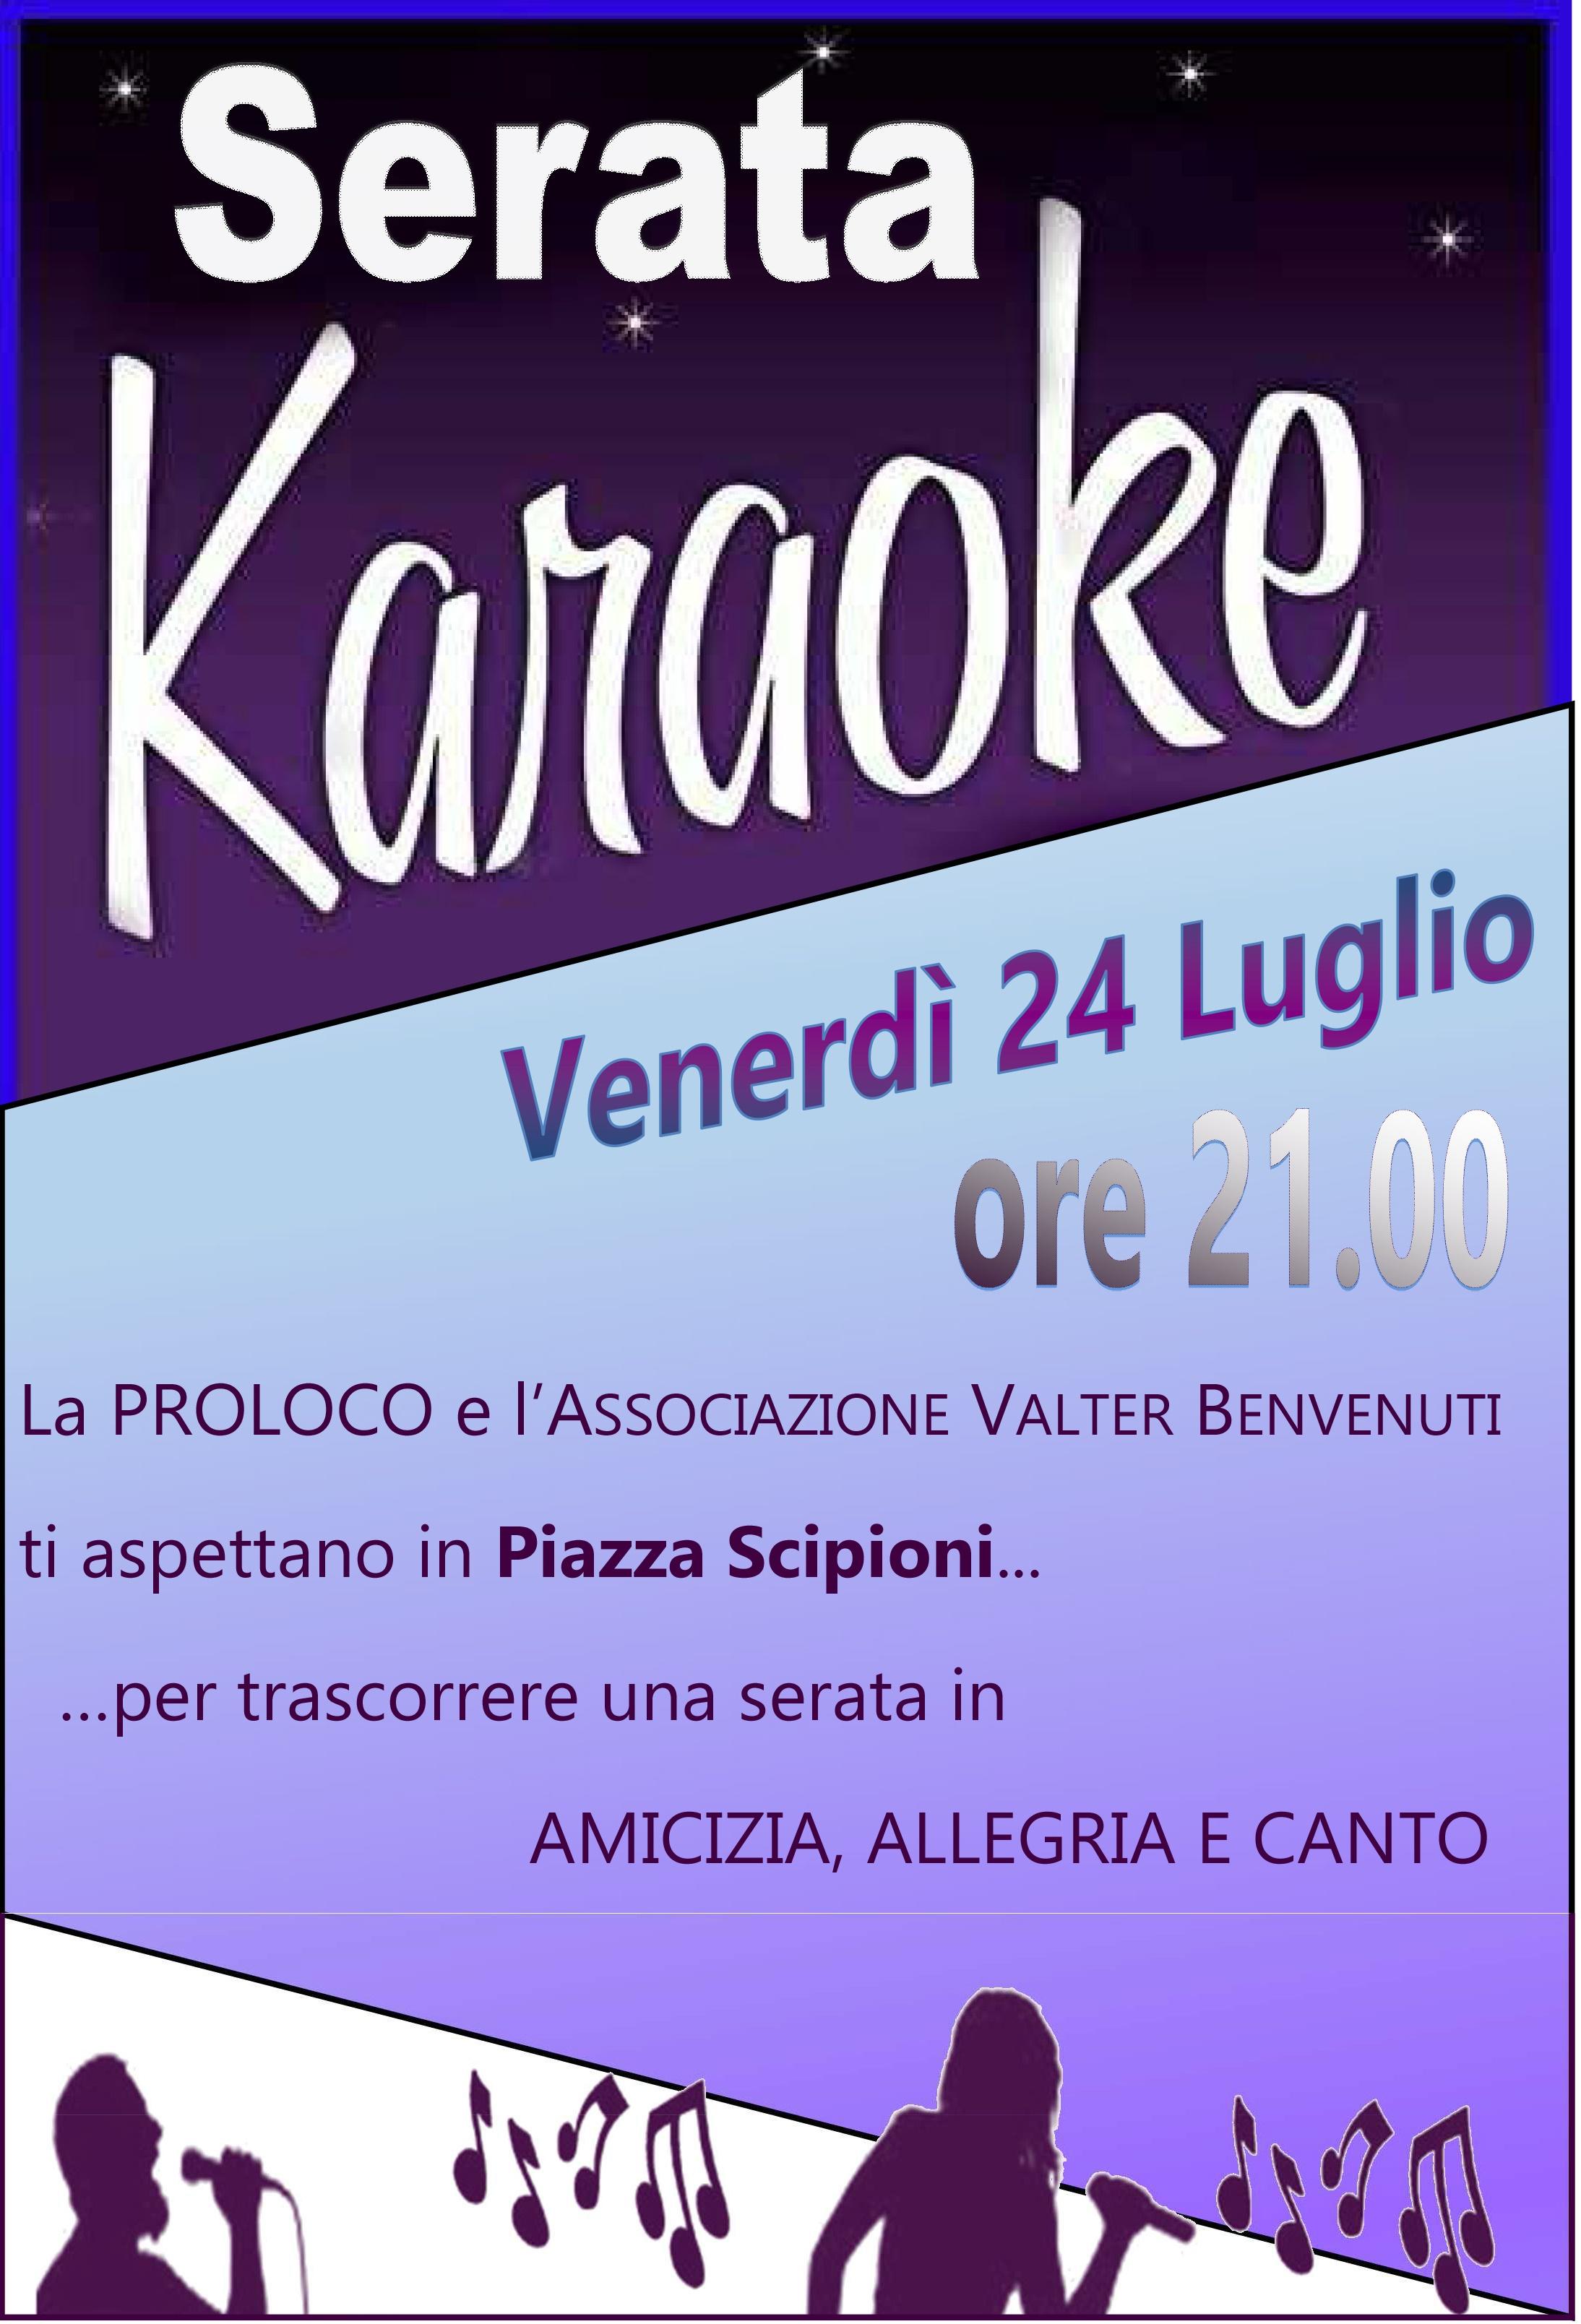 Locandina Karaoke - Karaoke